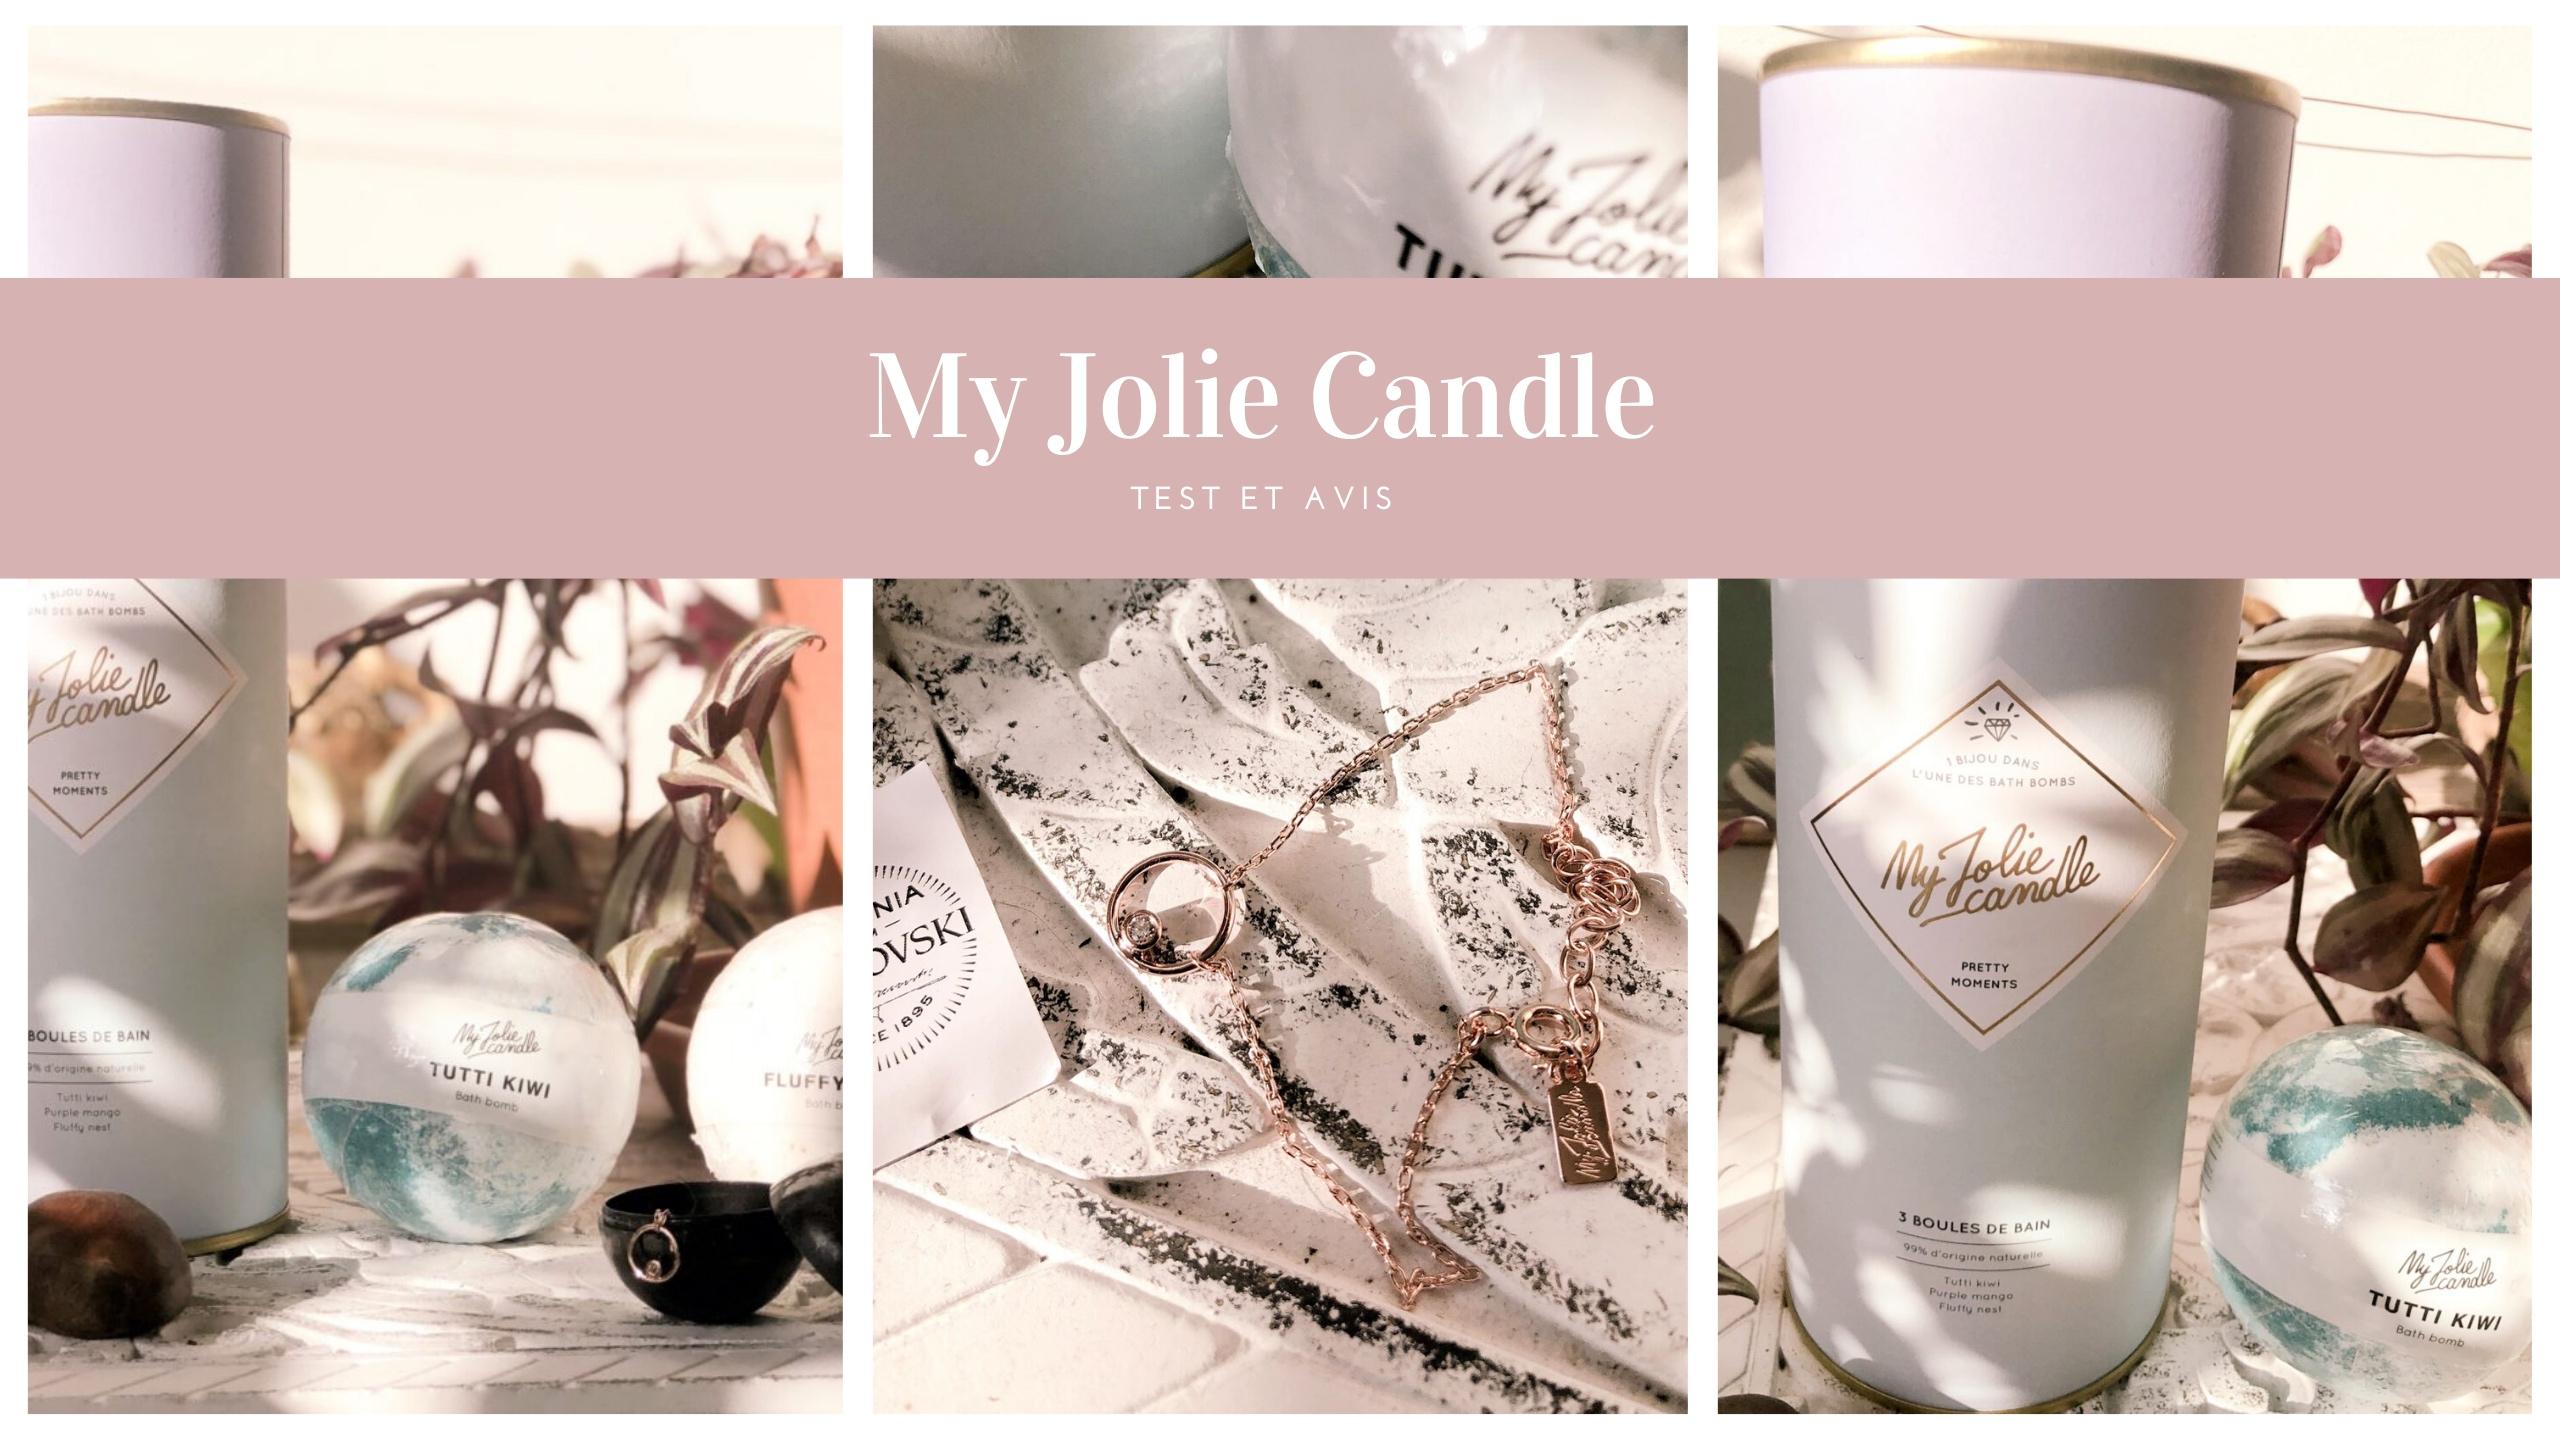 my jolie candle - avis